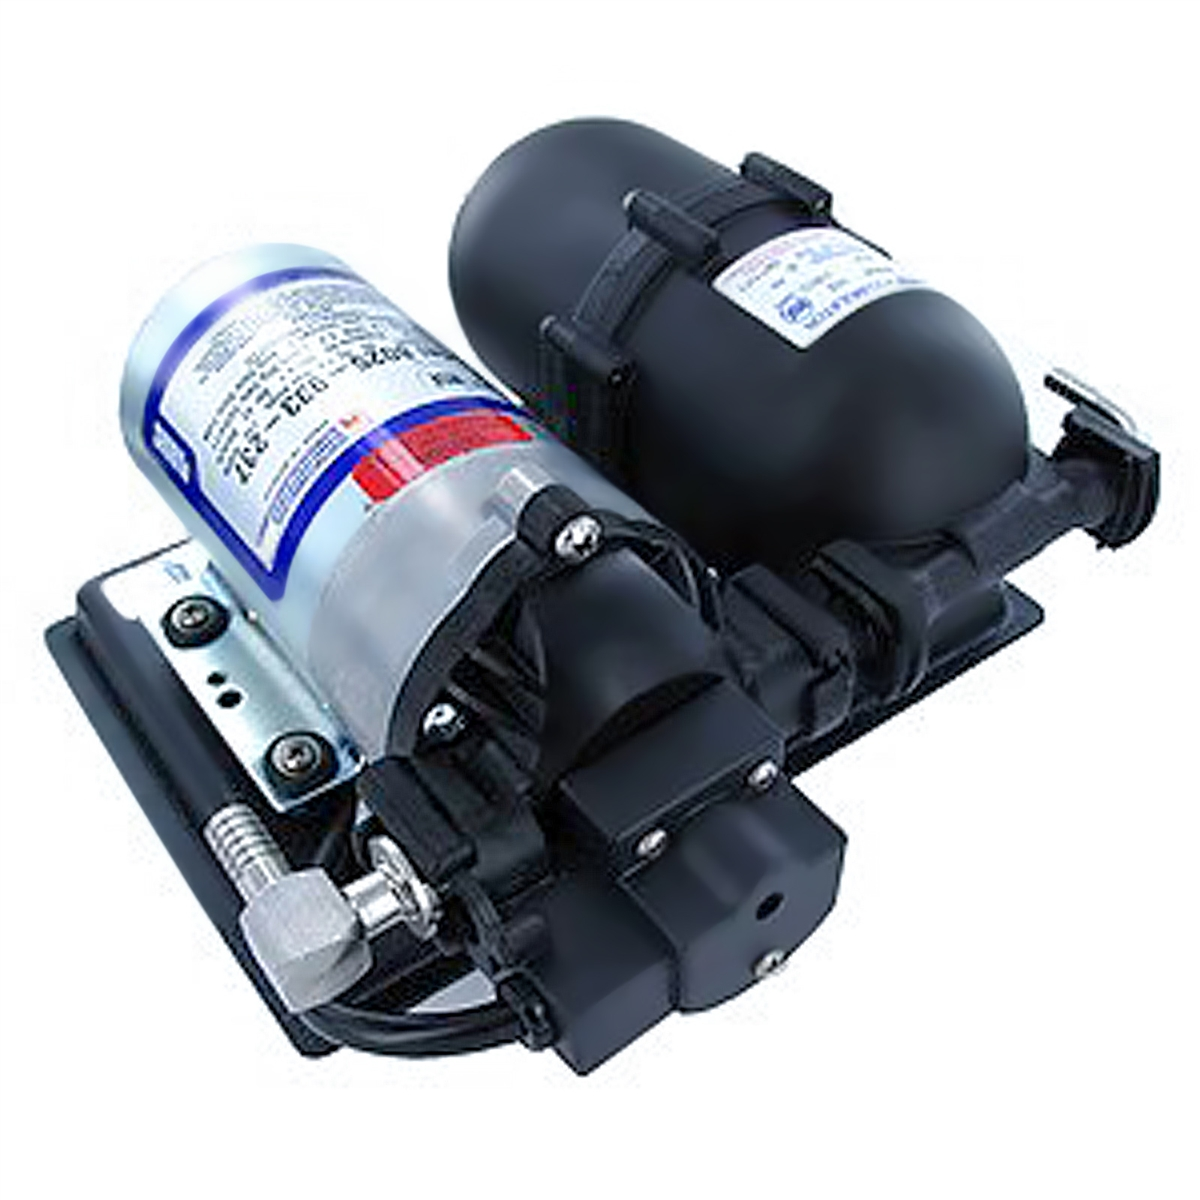 Shurflo Pump 804 001